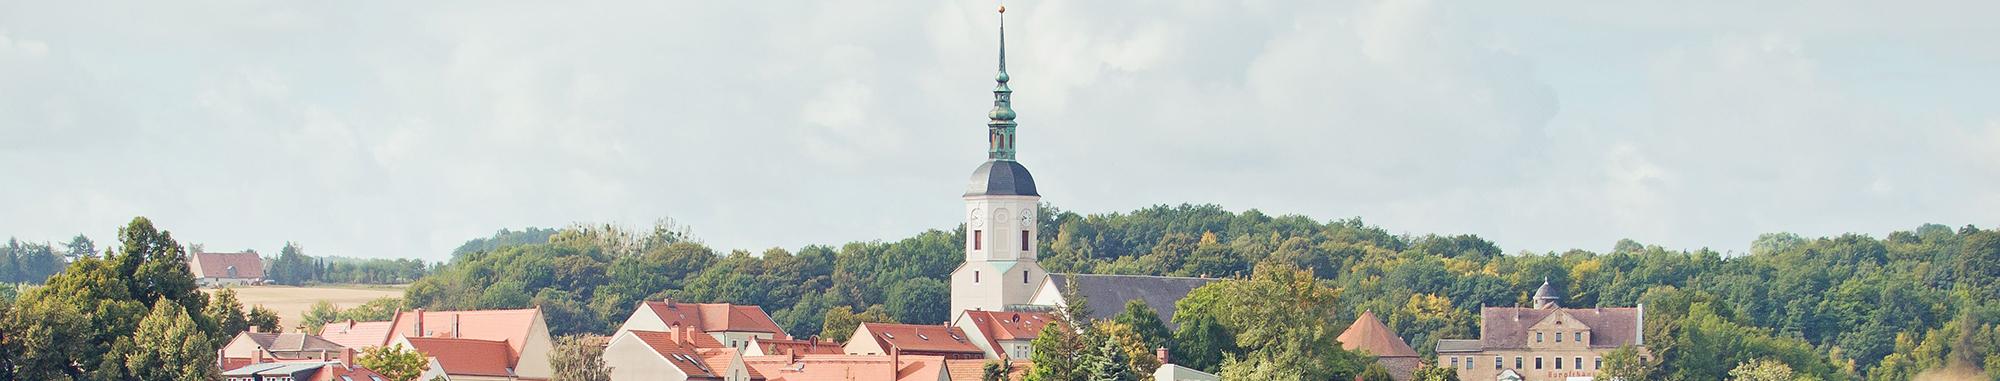 Stadt Dohna Banner